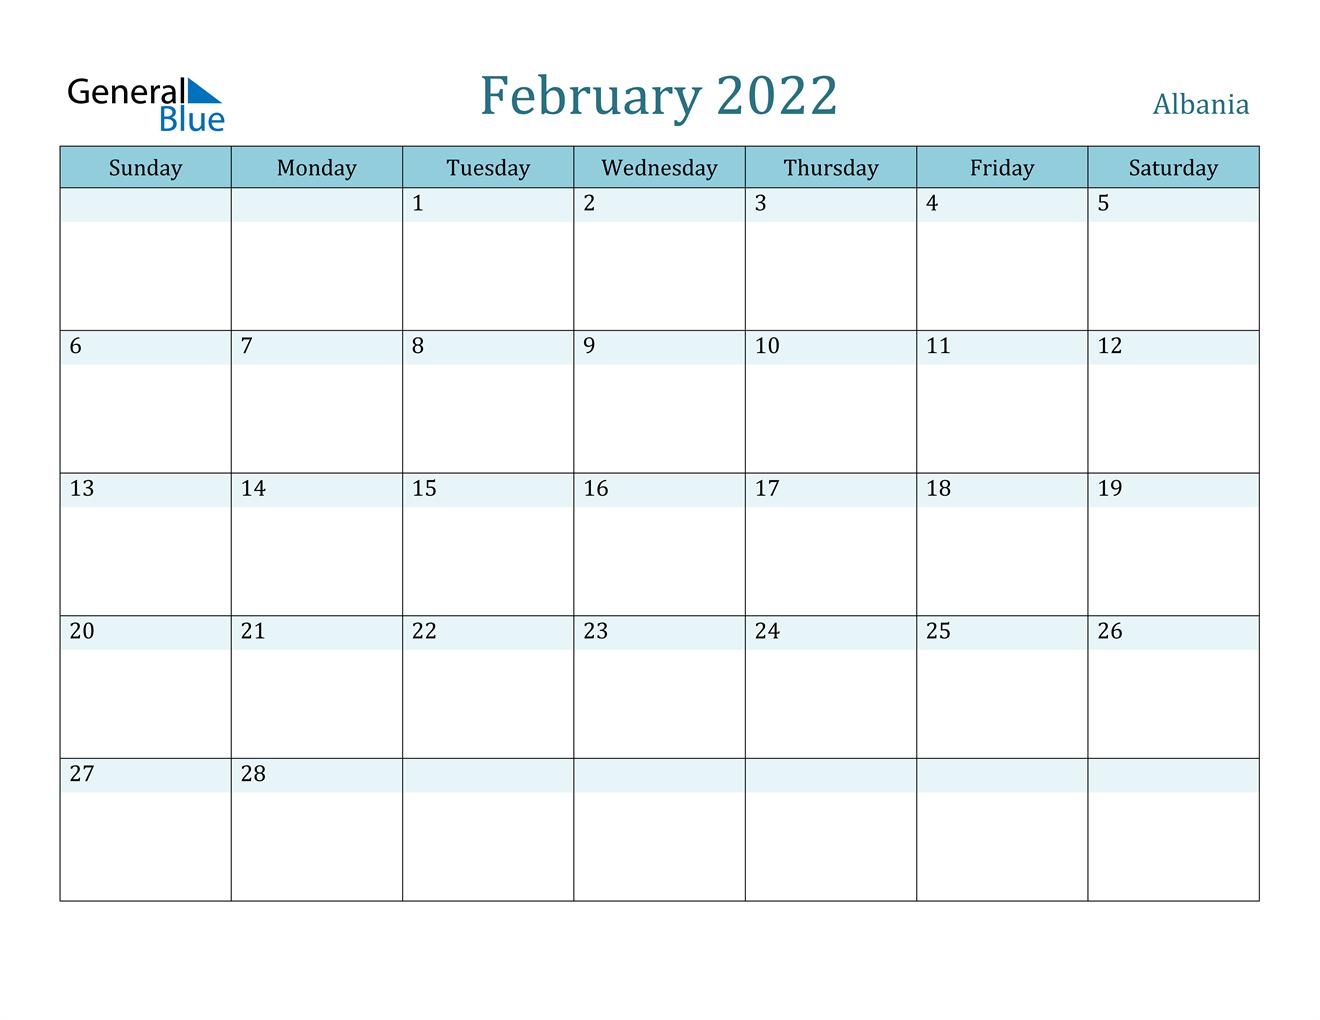 February 2022 Calendar - Albania With Feb 2022 Calendar Template